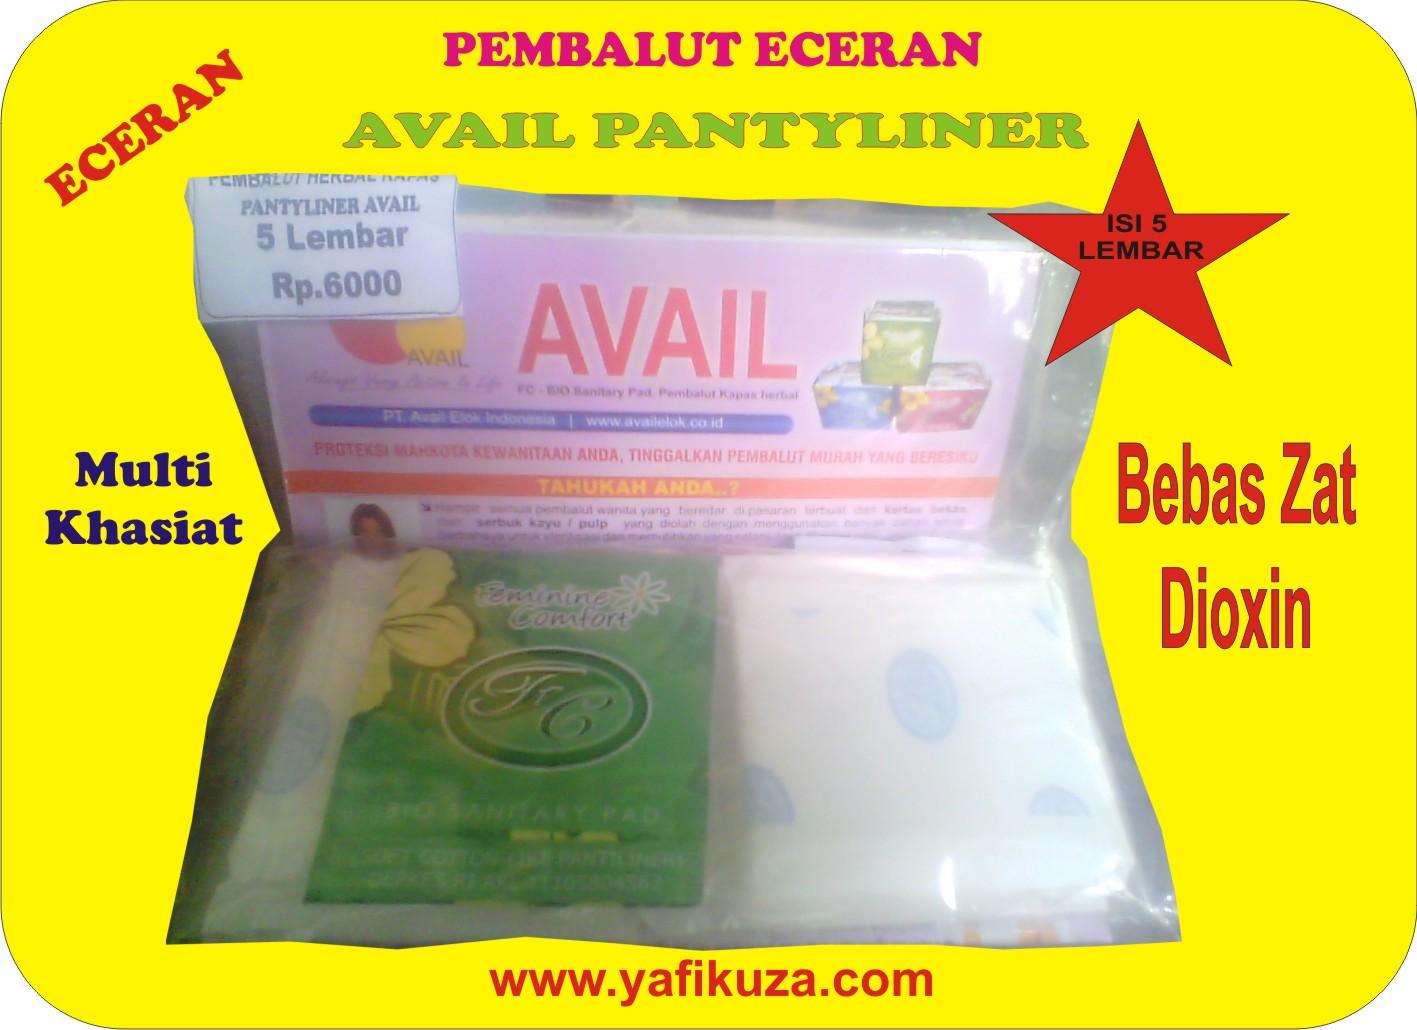 Jual Pembalut Herbal Avail Pantyliner Eceran 5 Lembar 100 Original Pantiliner Yafikuza Shop Tokopedia